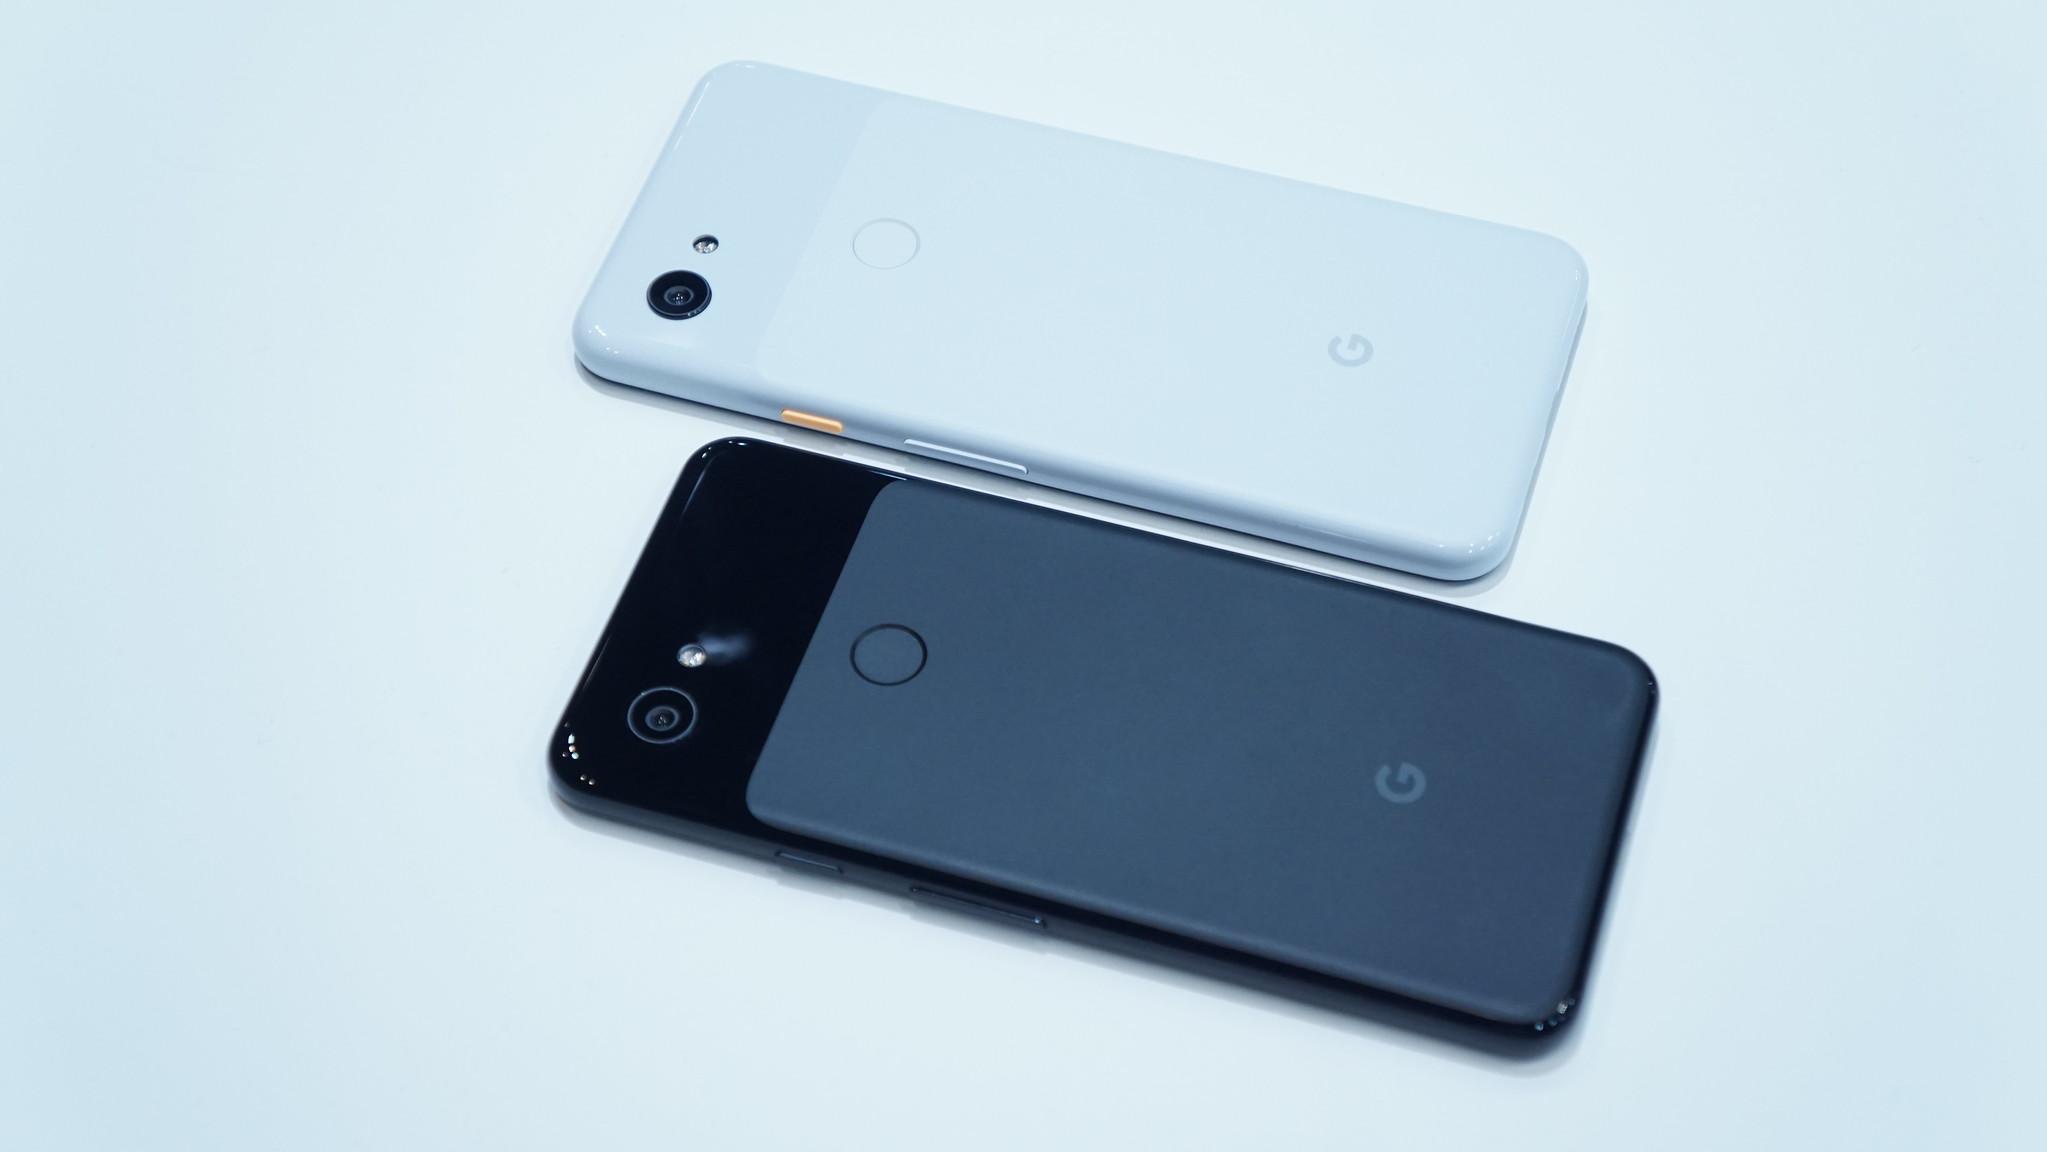 Google、GWセールで「Pixel 3a XL」が6万円→3.9万円に。3aよりも1万円安く